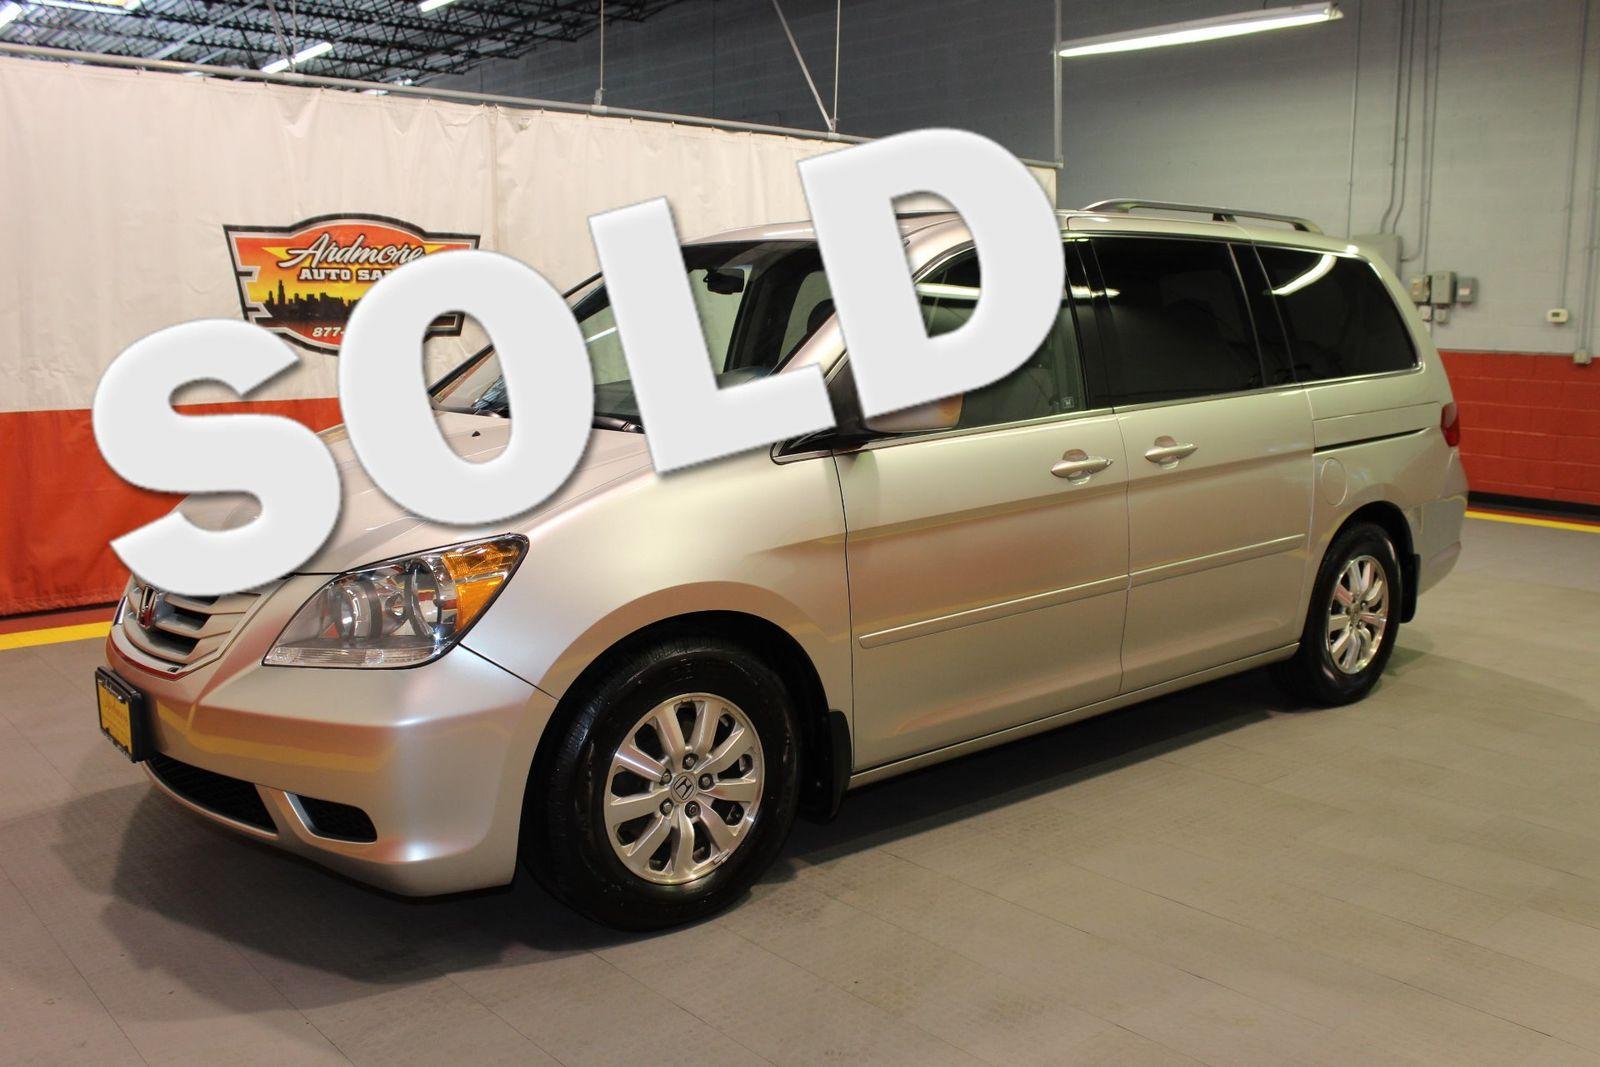 2008 honda odyssey ex l city illinois ardmore auto sales in west chicago illinois